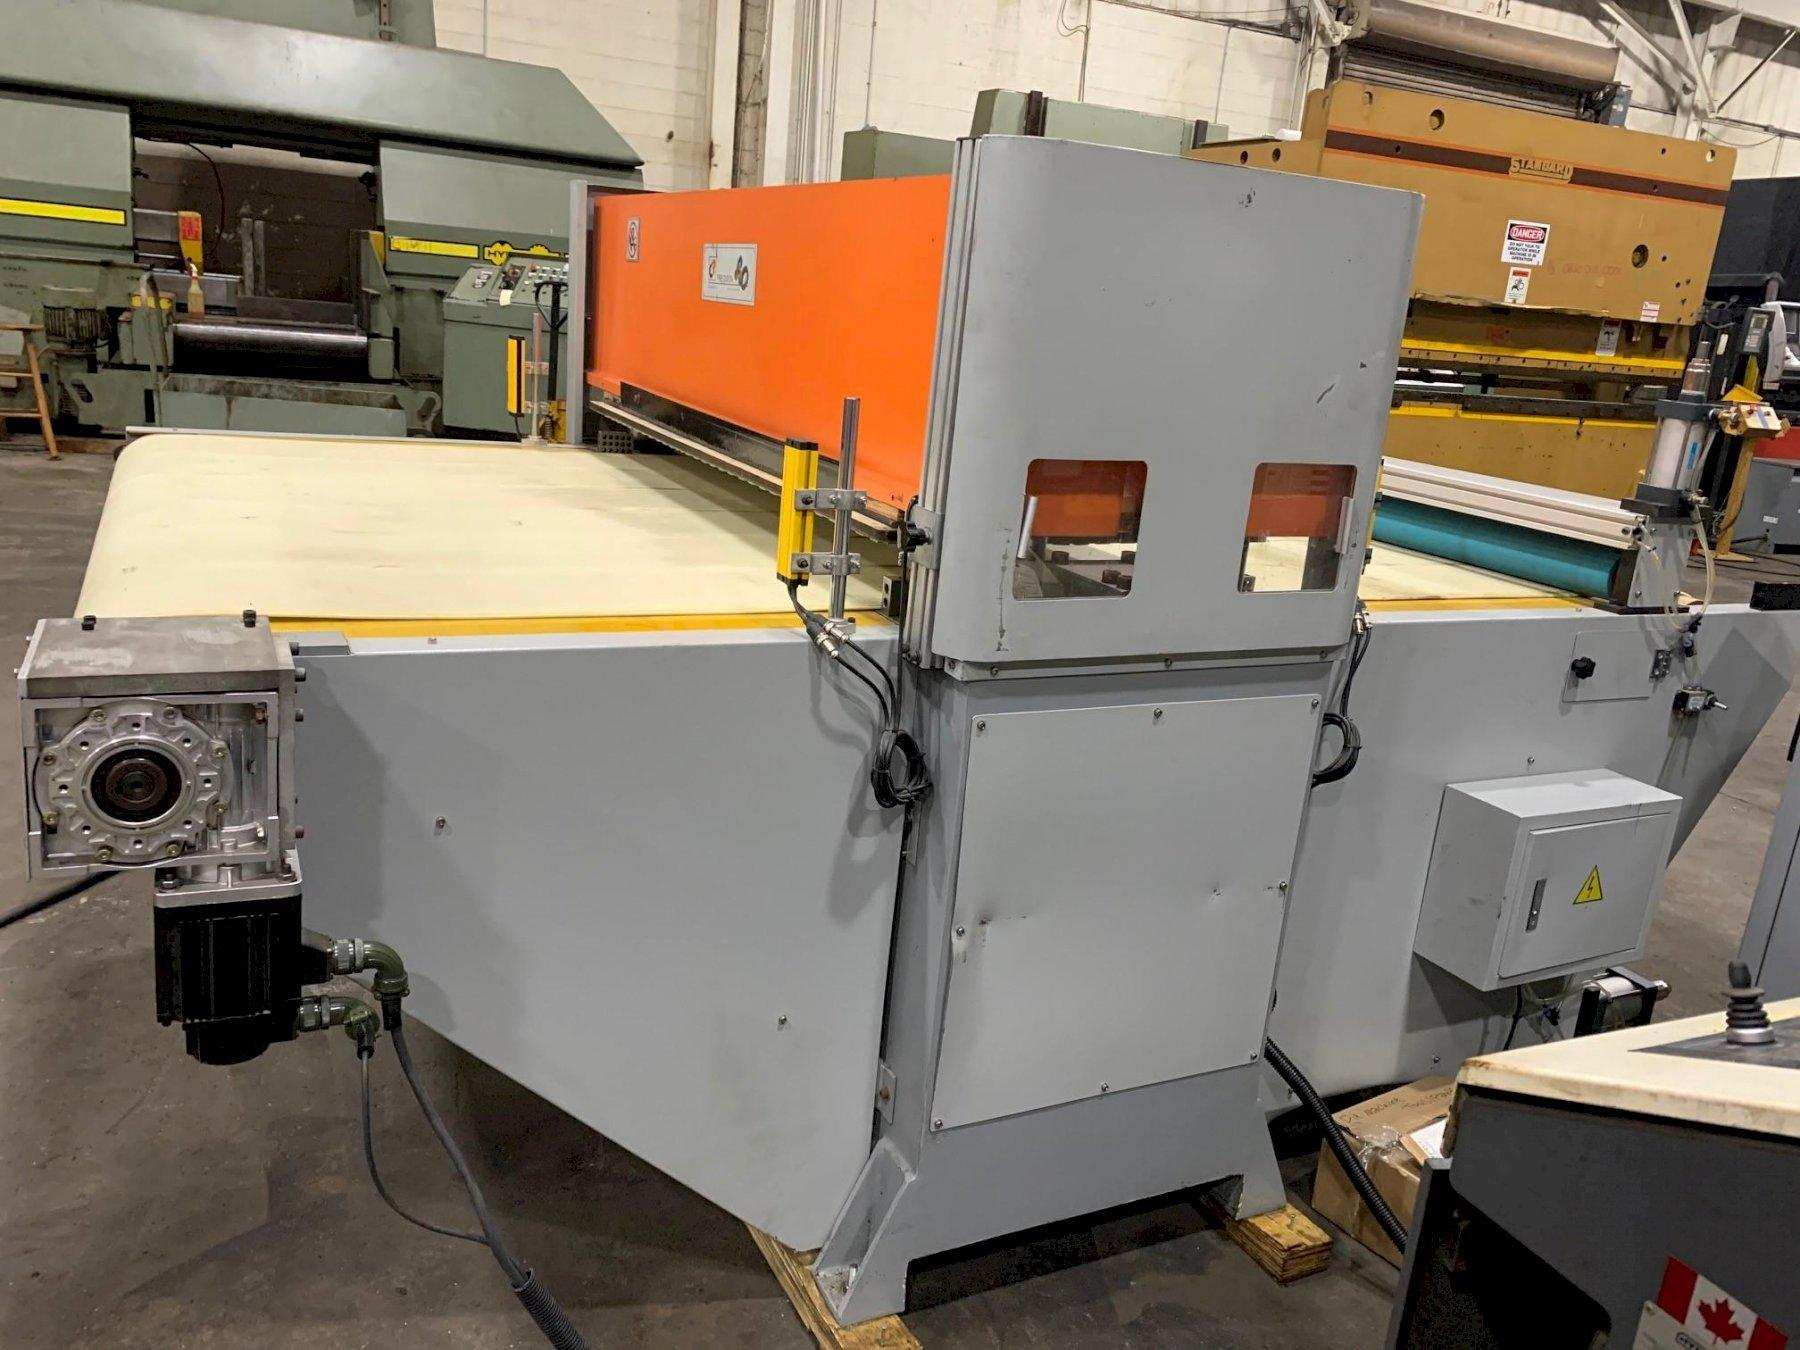 USED CJRTECH 40 TON CNC CONVEYORIZED CLICKER PRESS, Year: 2020, Stock# 10848